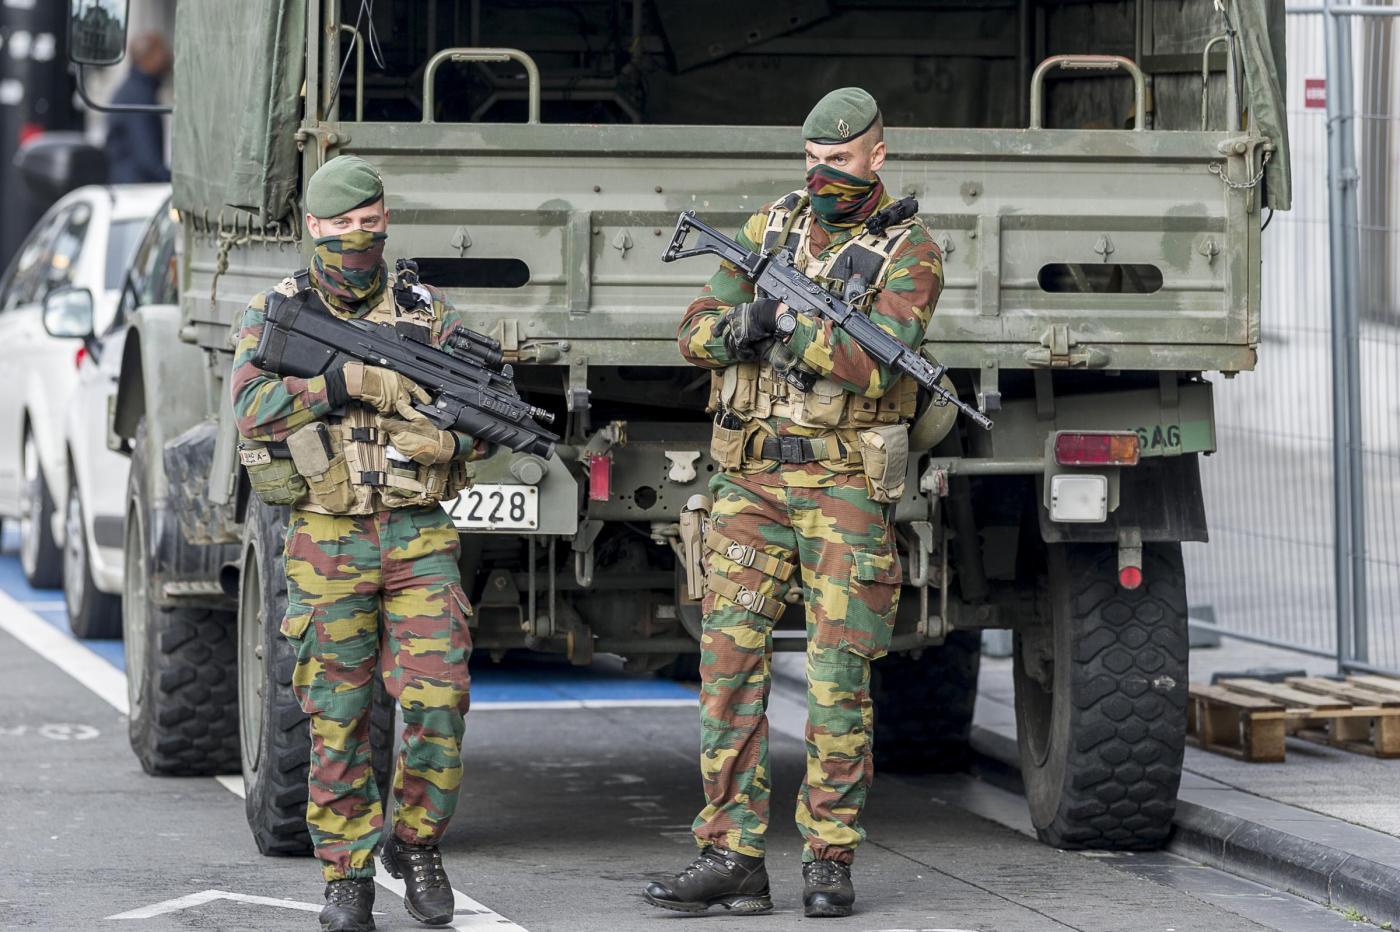 Bruxelles, 15enne con finto kalashnikov grida: 'Sono un terrorista'. Arrestato